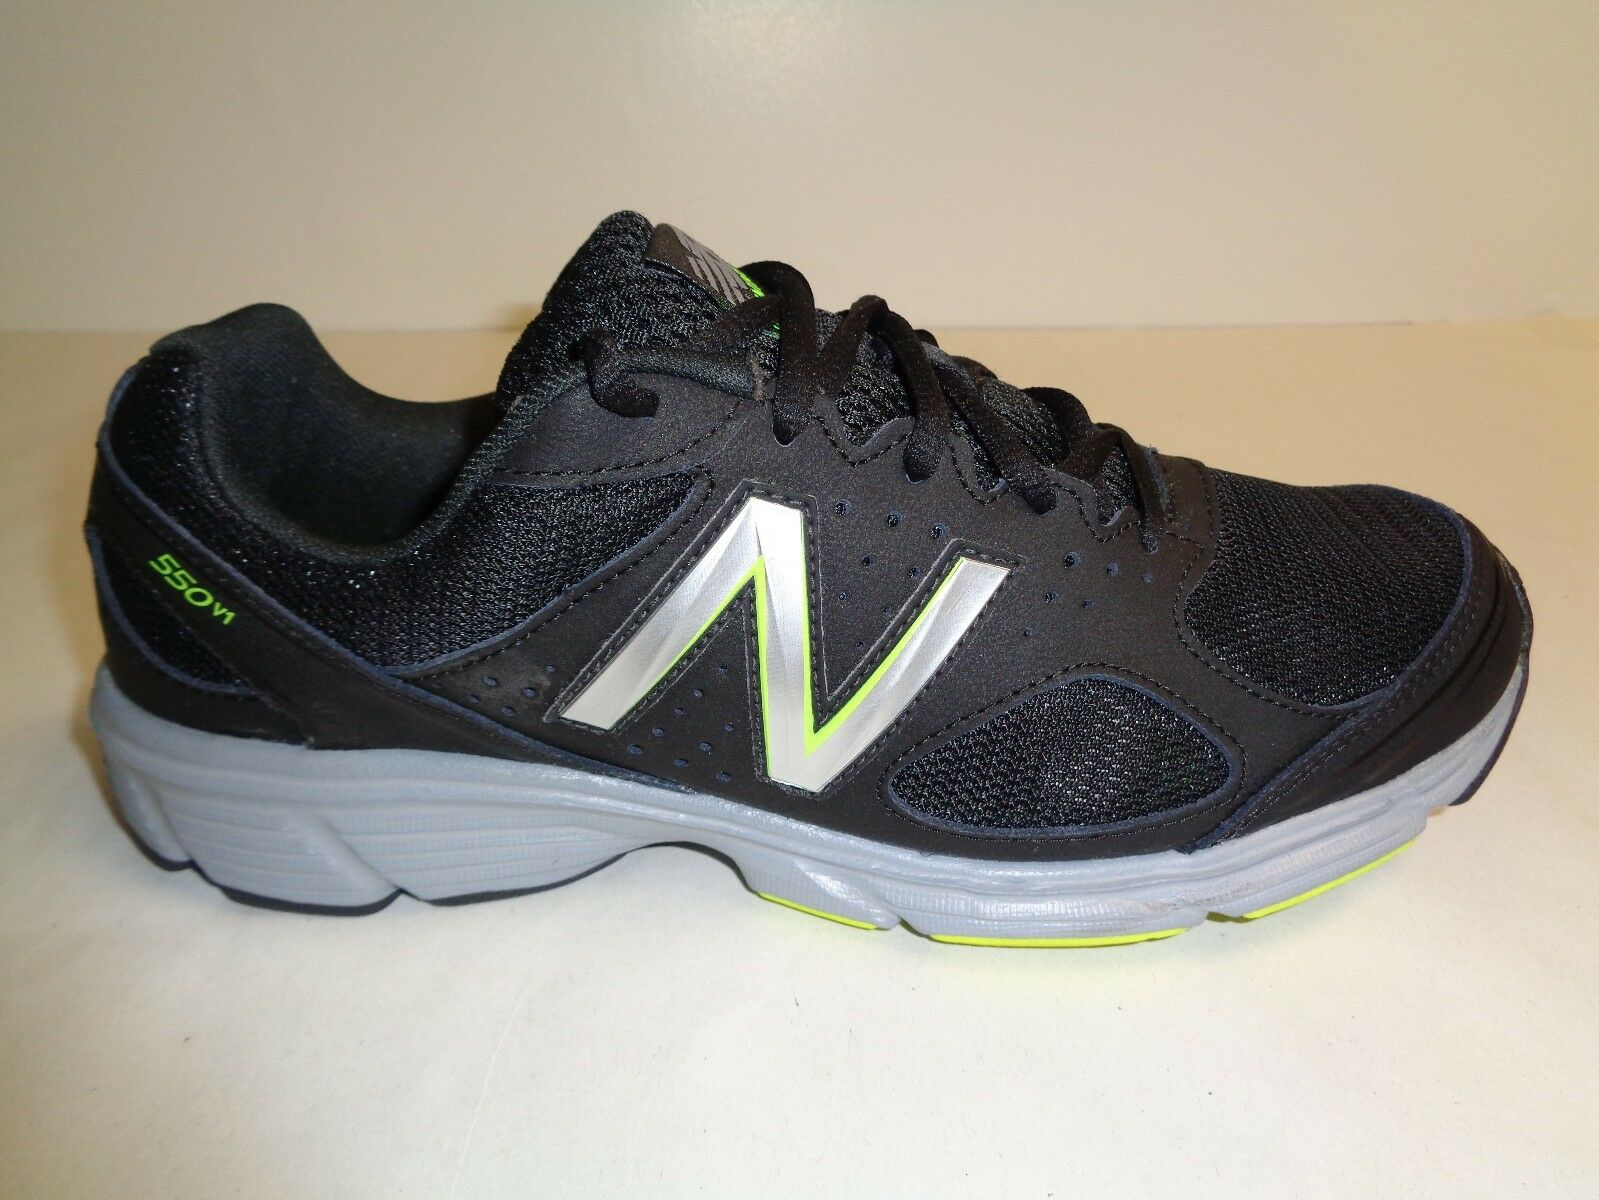 Tamaño 8.5 M New Balance 550V1 M550V1 Negro Nuevo Para hombres Zapatos tenis de correr